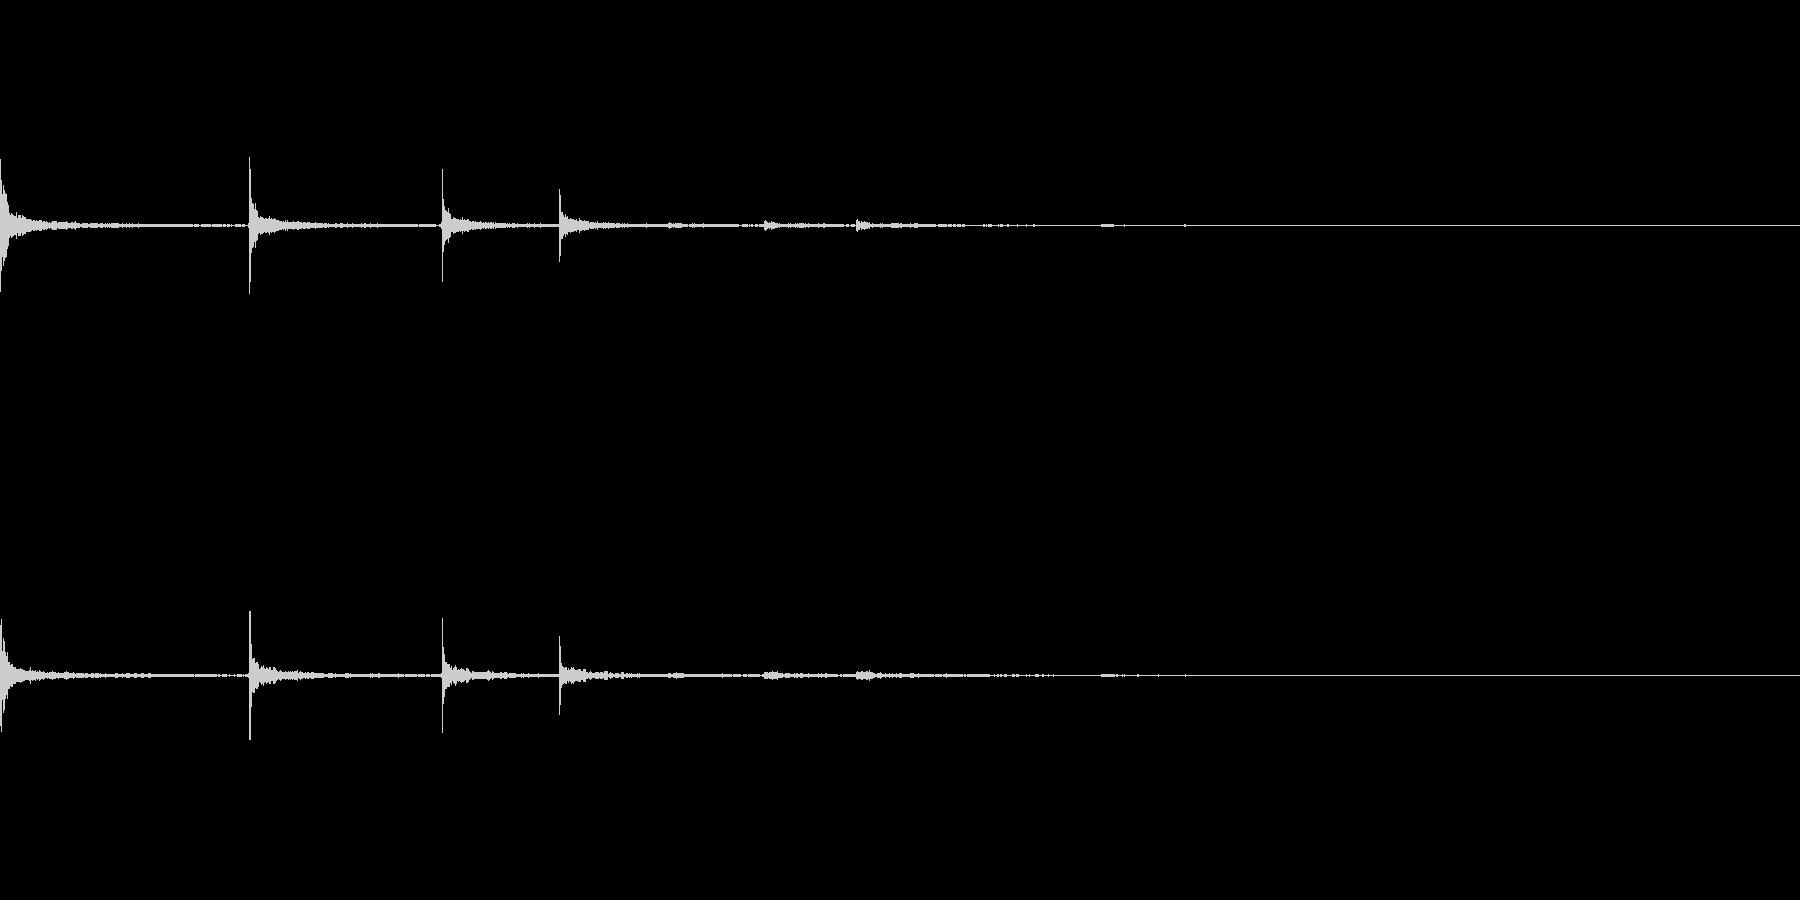 【SE 効果音】金属音の未再生の波形